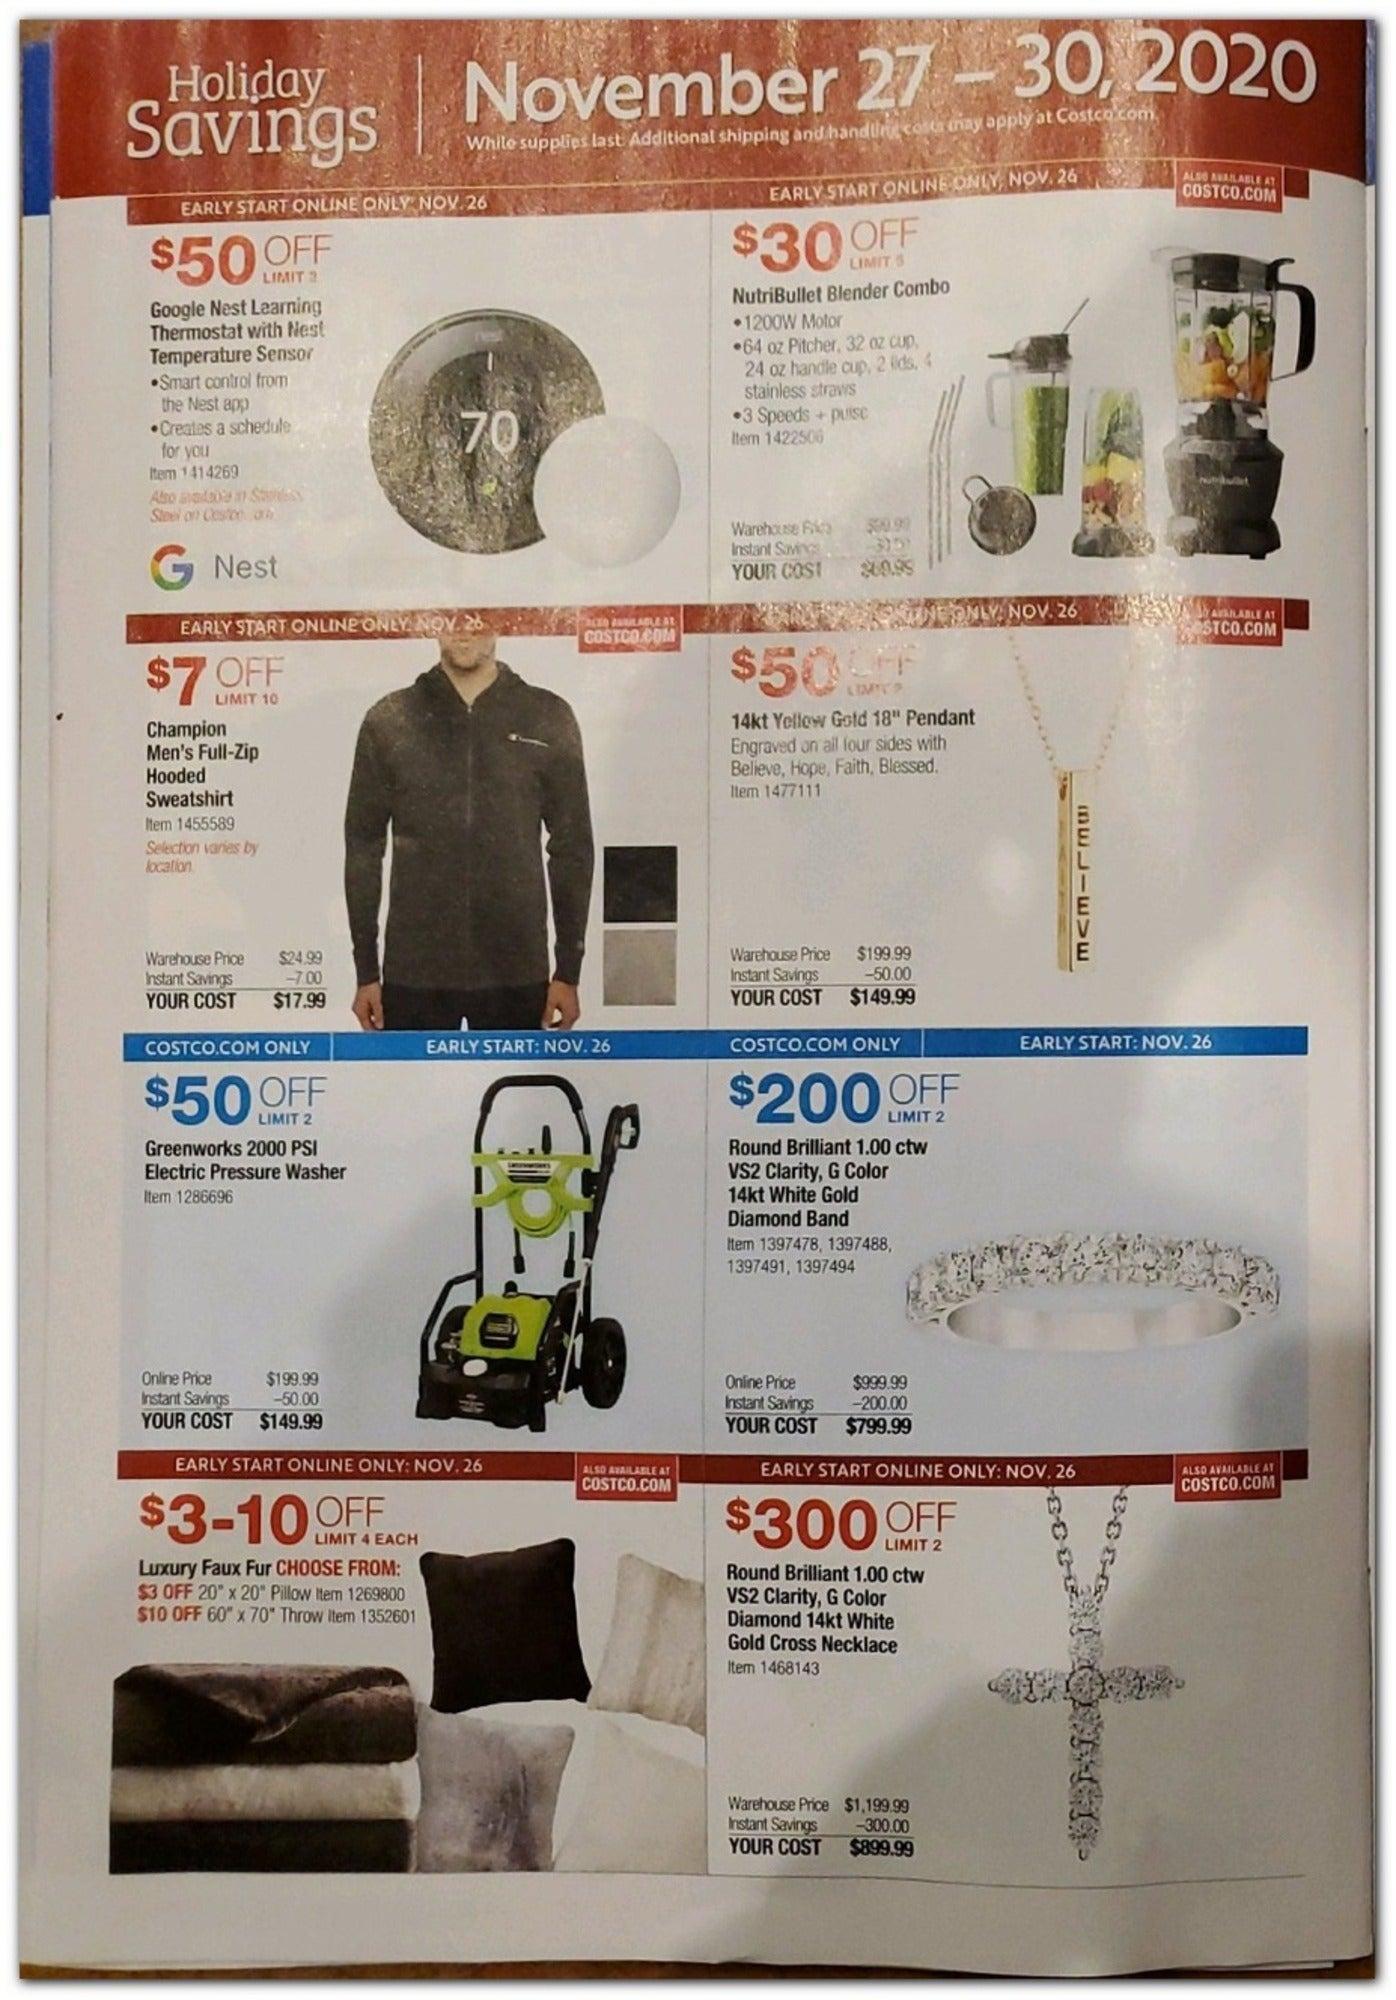 Costco Black Friday 2020 Page 30